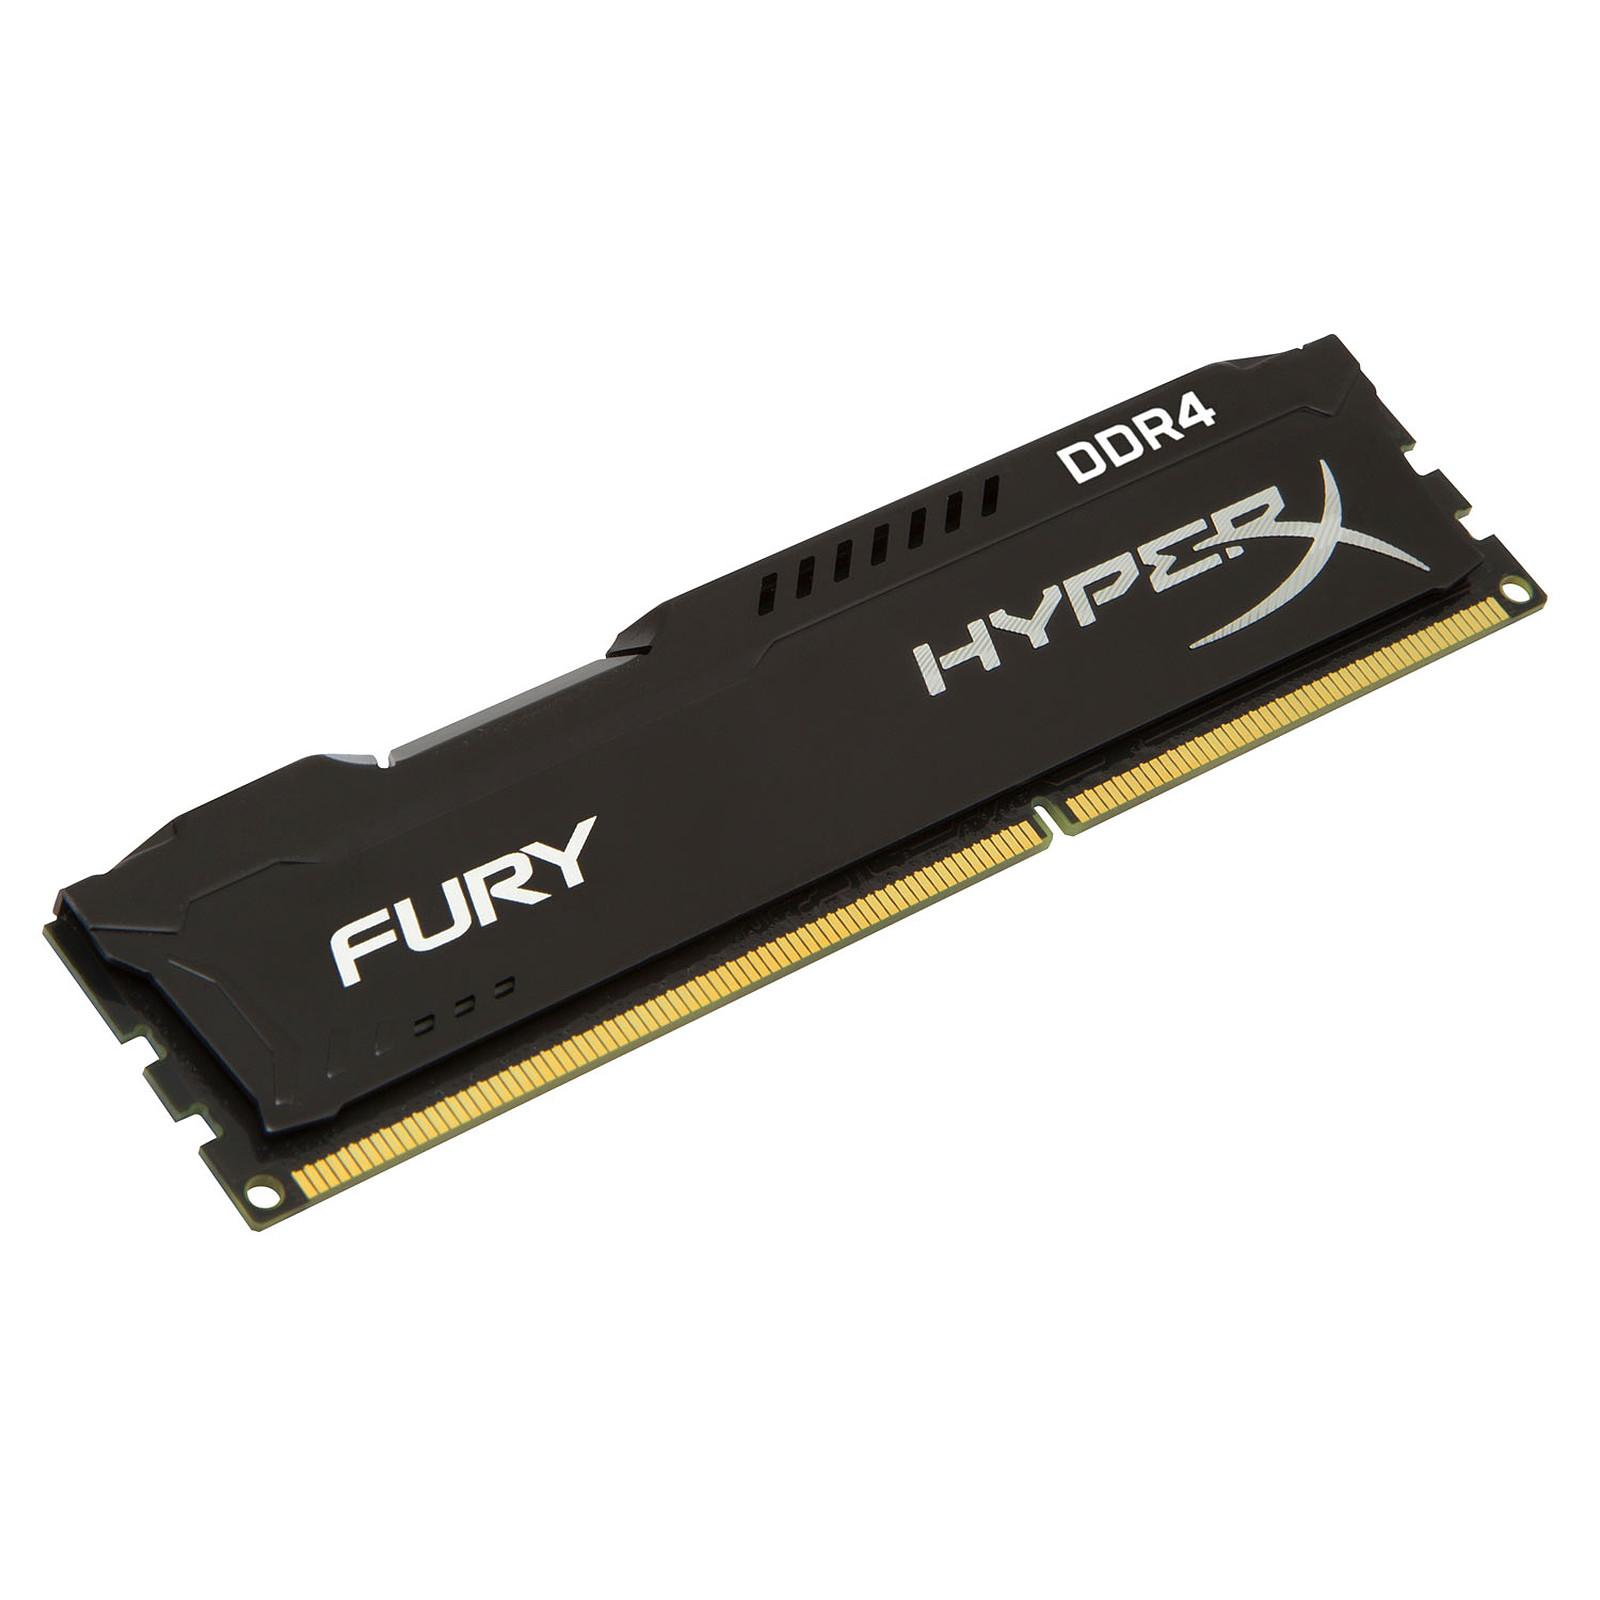 HyperX Fury Noir 16 Go DDR4 2400 MHz CL15